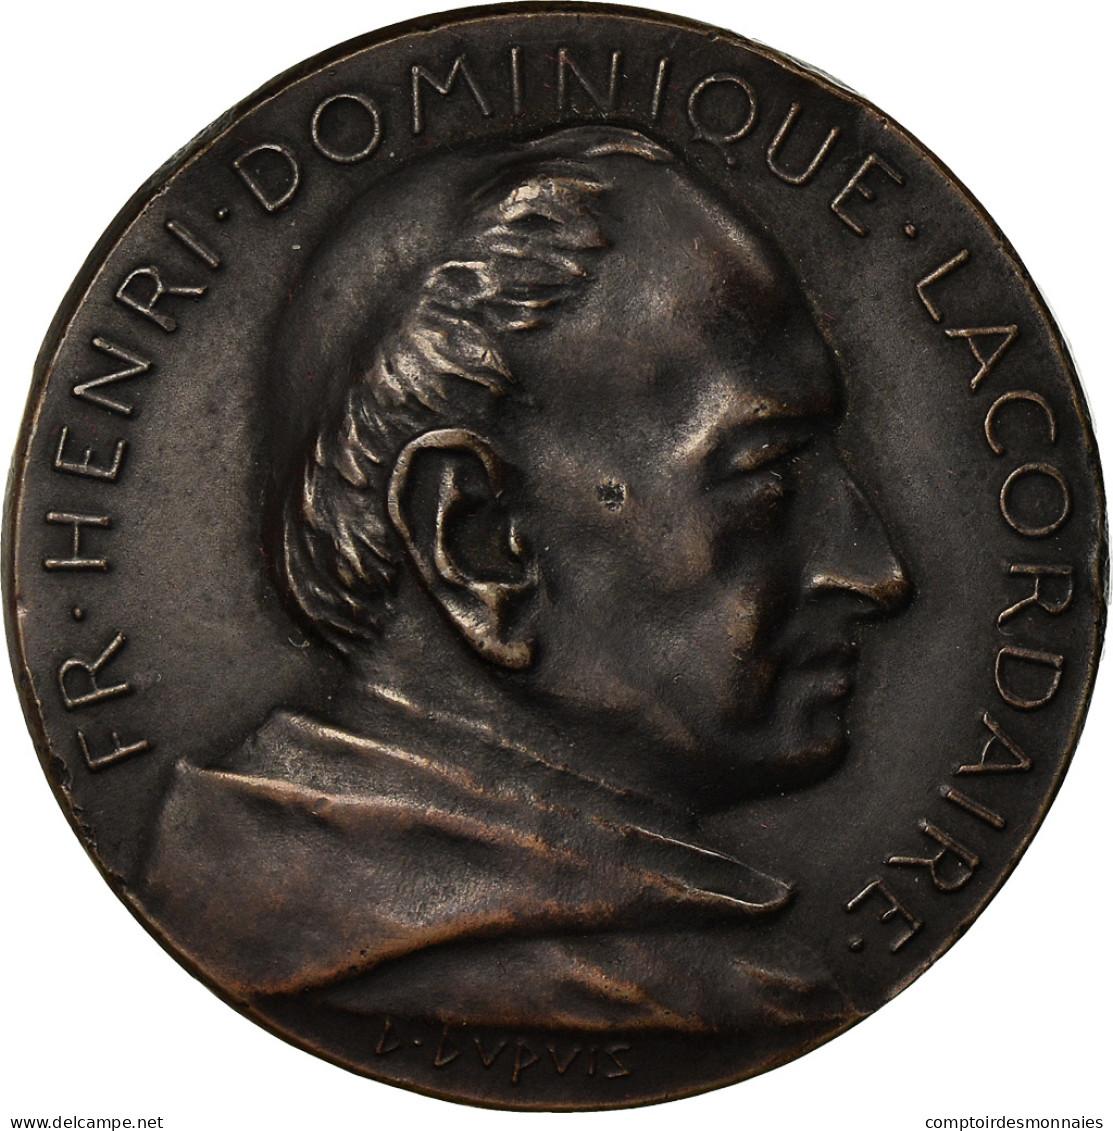 France, Medal, French Third Republic, Politics, Society, War, 1907, Dupuis.D - France